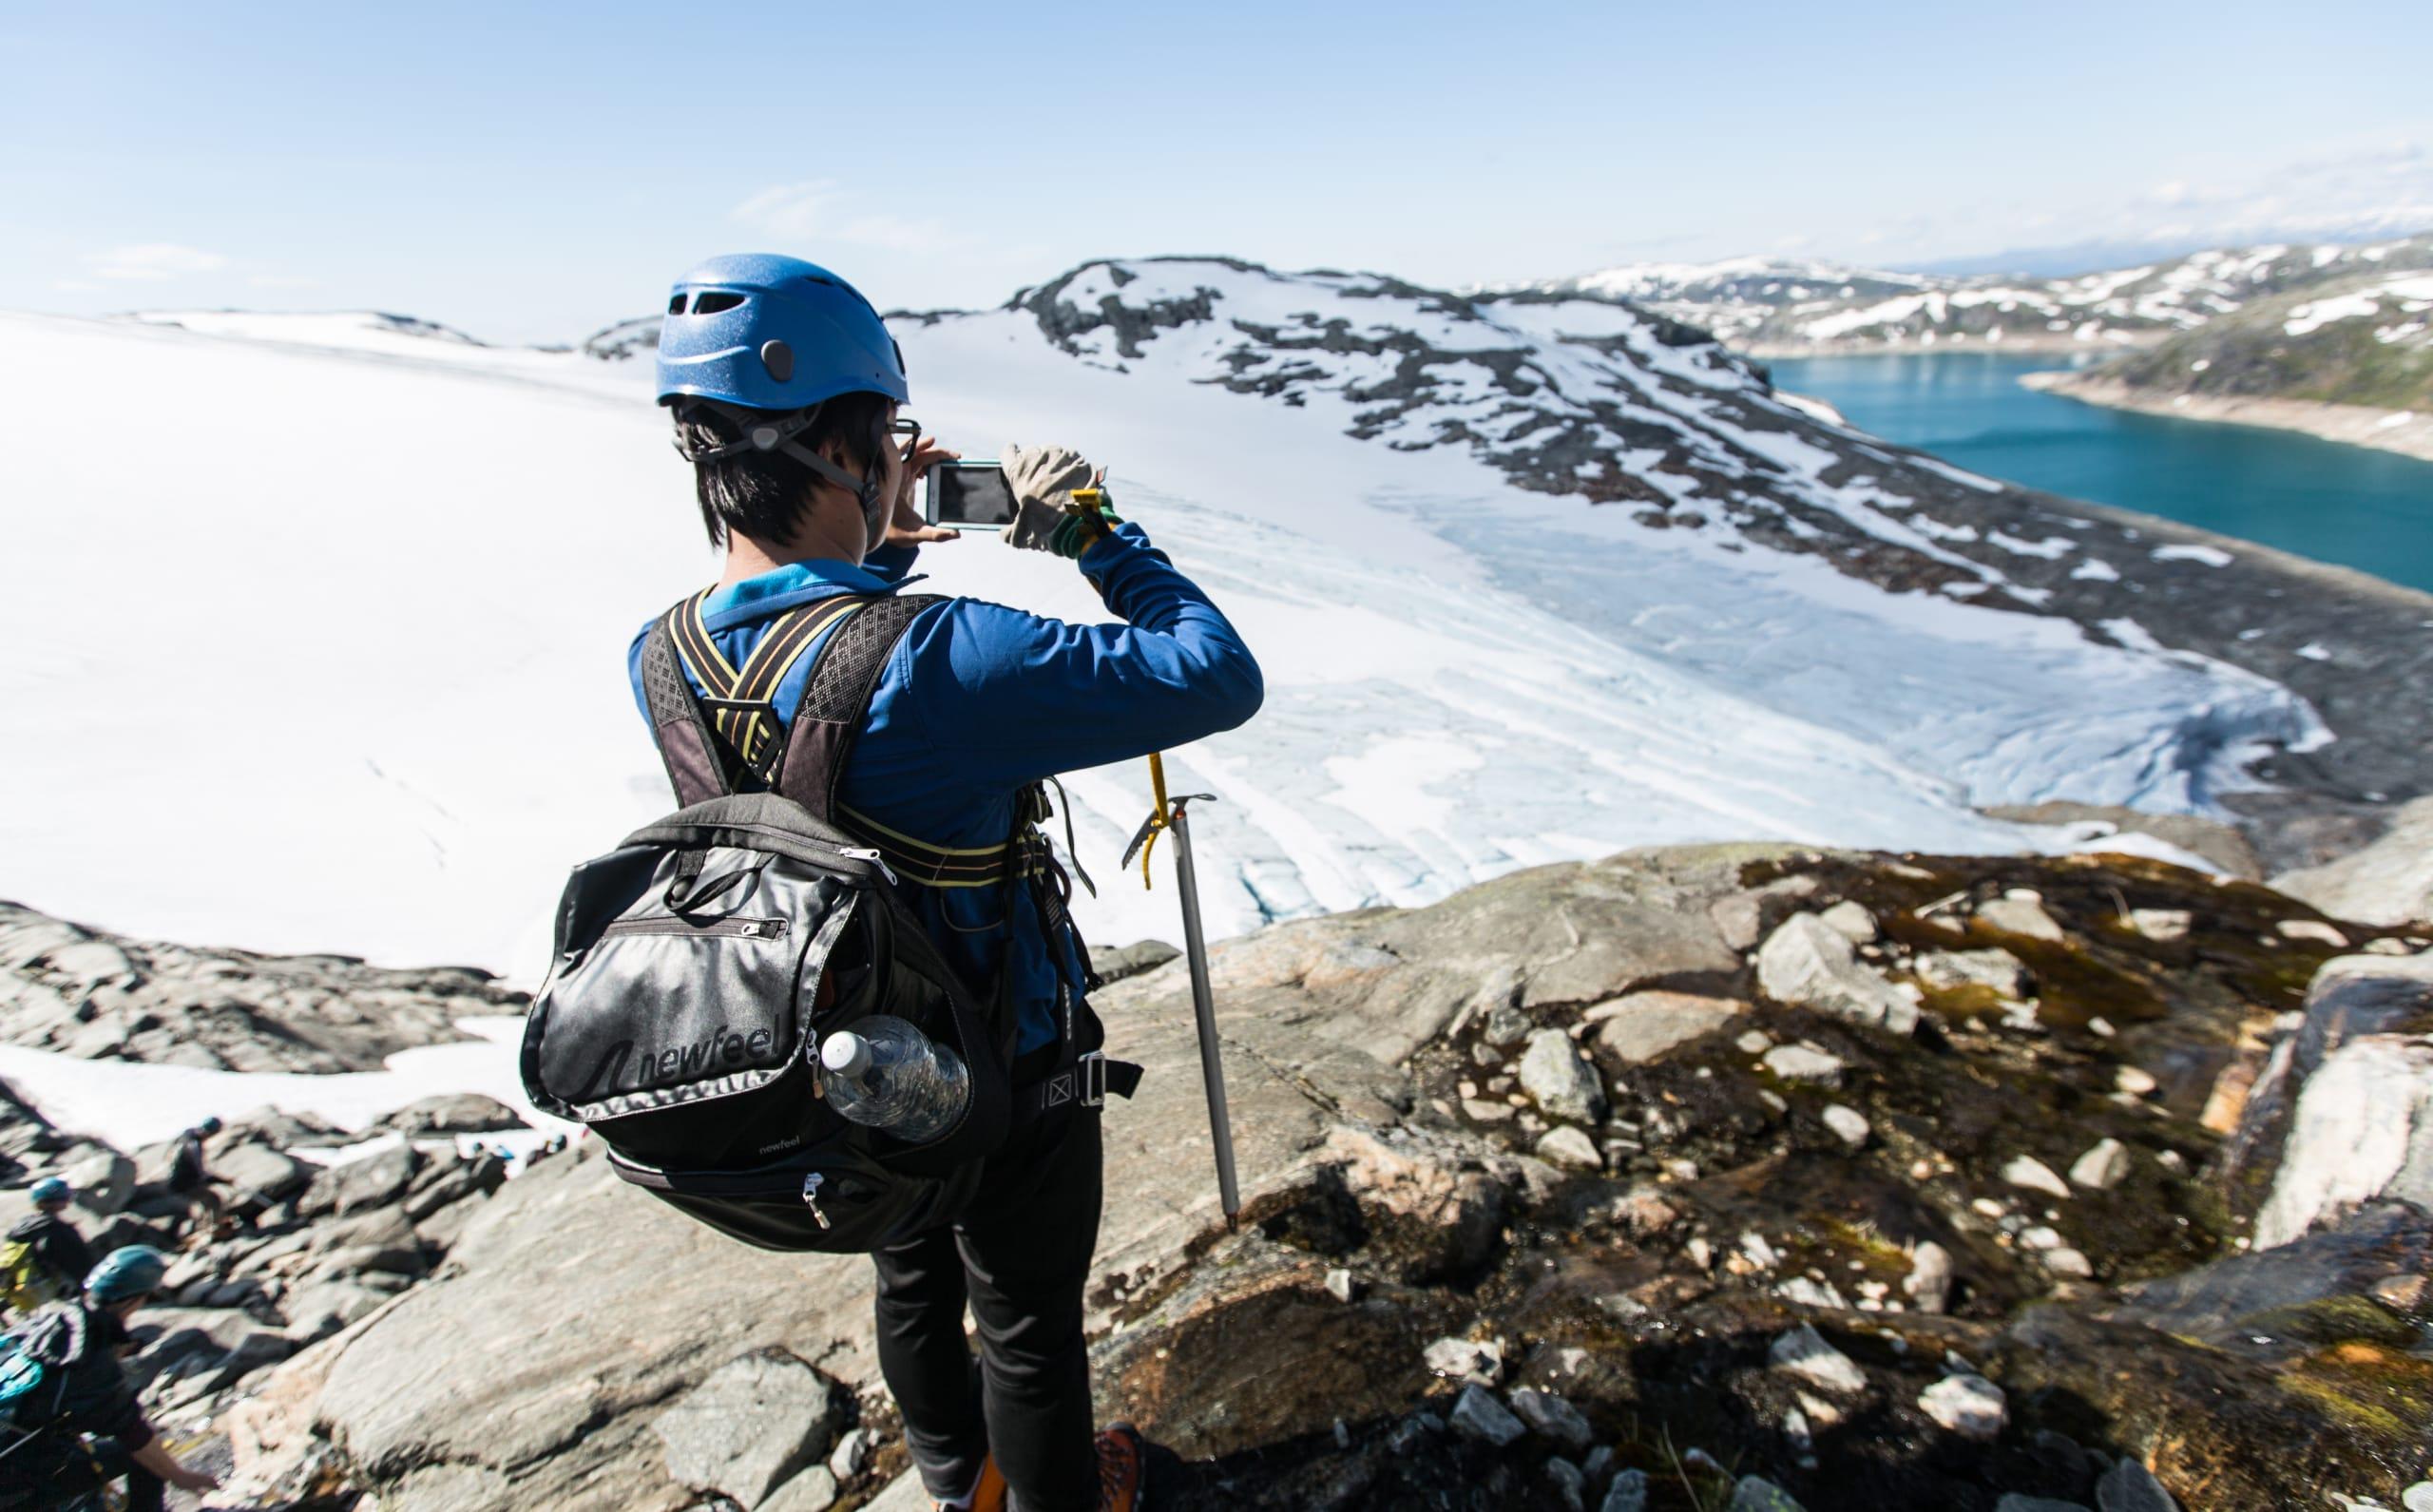 Glacier hiking taking photo at viewpoint overlooking Folgefonna